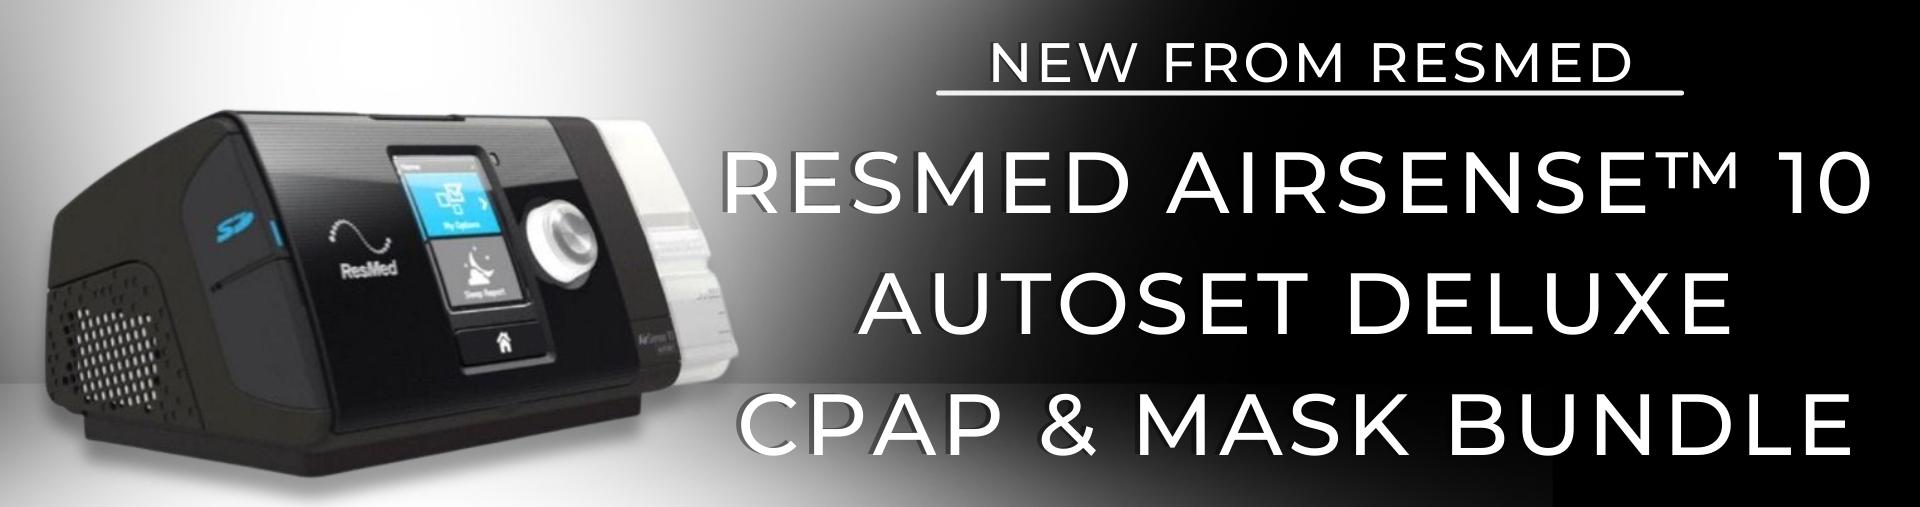 ResMed AirSense™ 10 AutoSet Deluxe CPAP Bundle